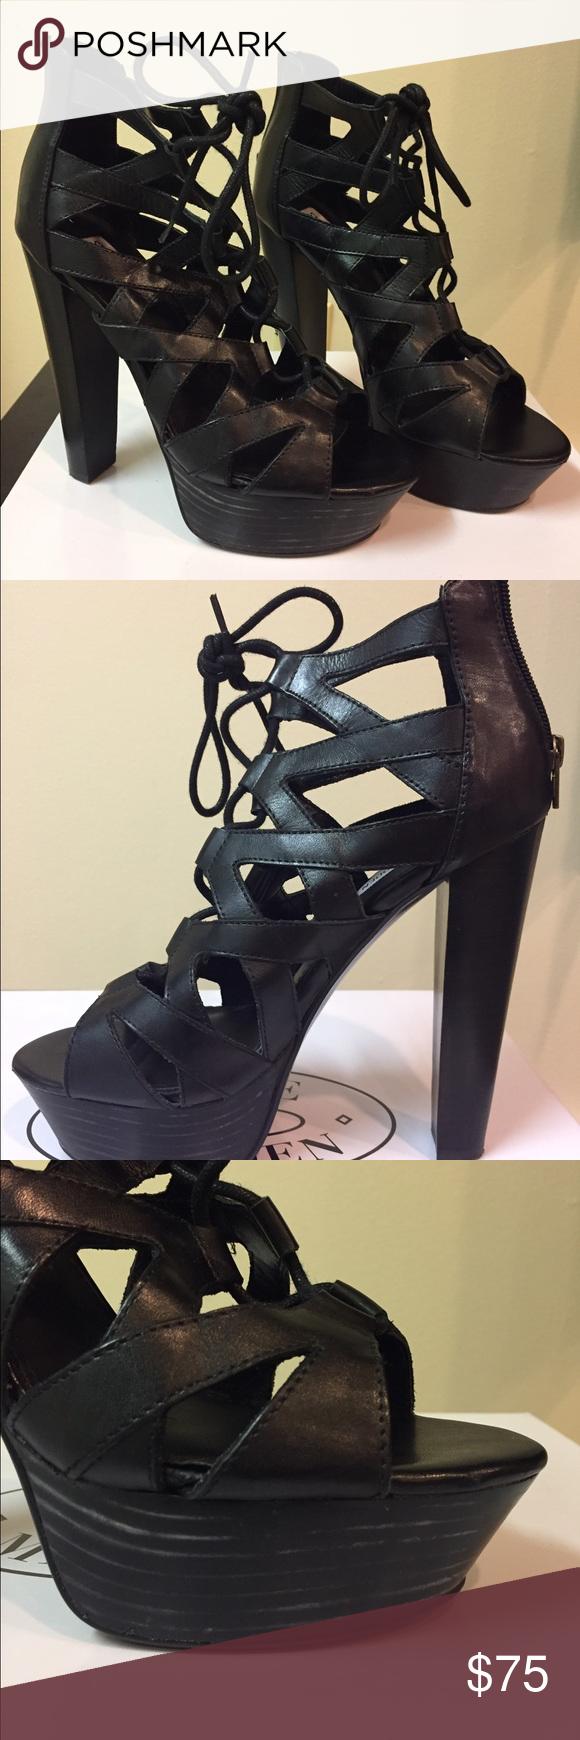 bc9d6ba5660 Steve Madden Dream Girl heels Beautiful shoe, size 8! 5 1/2